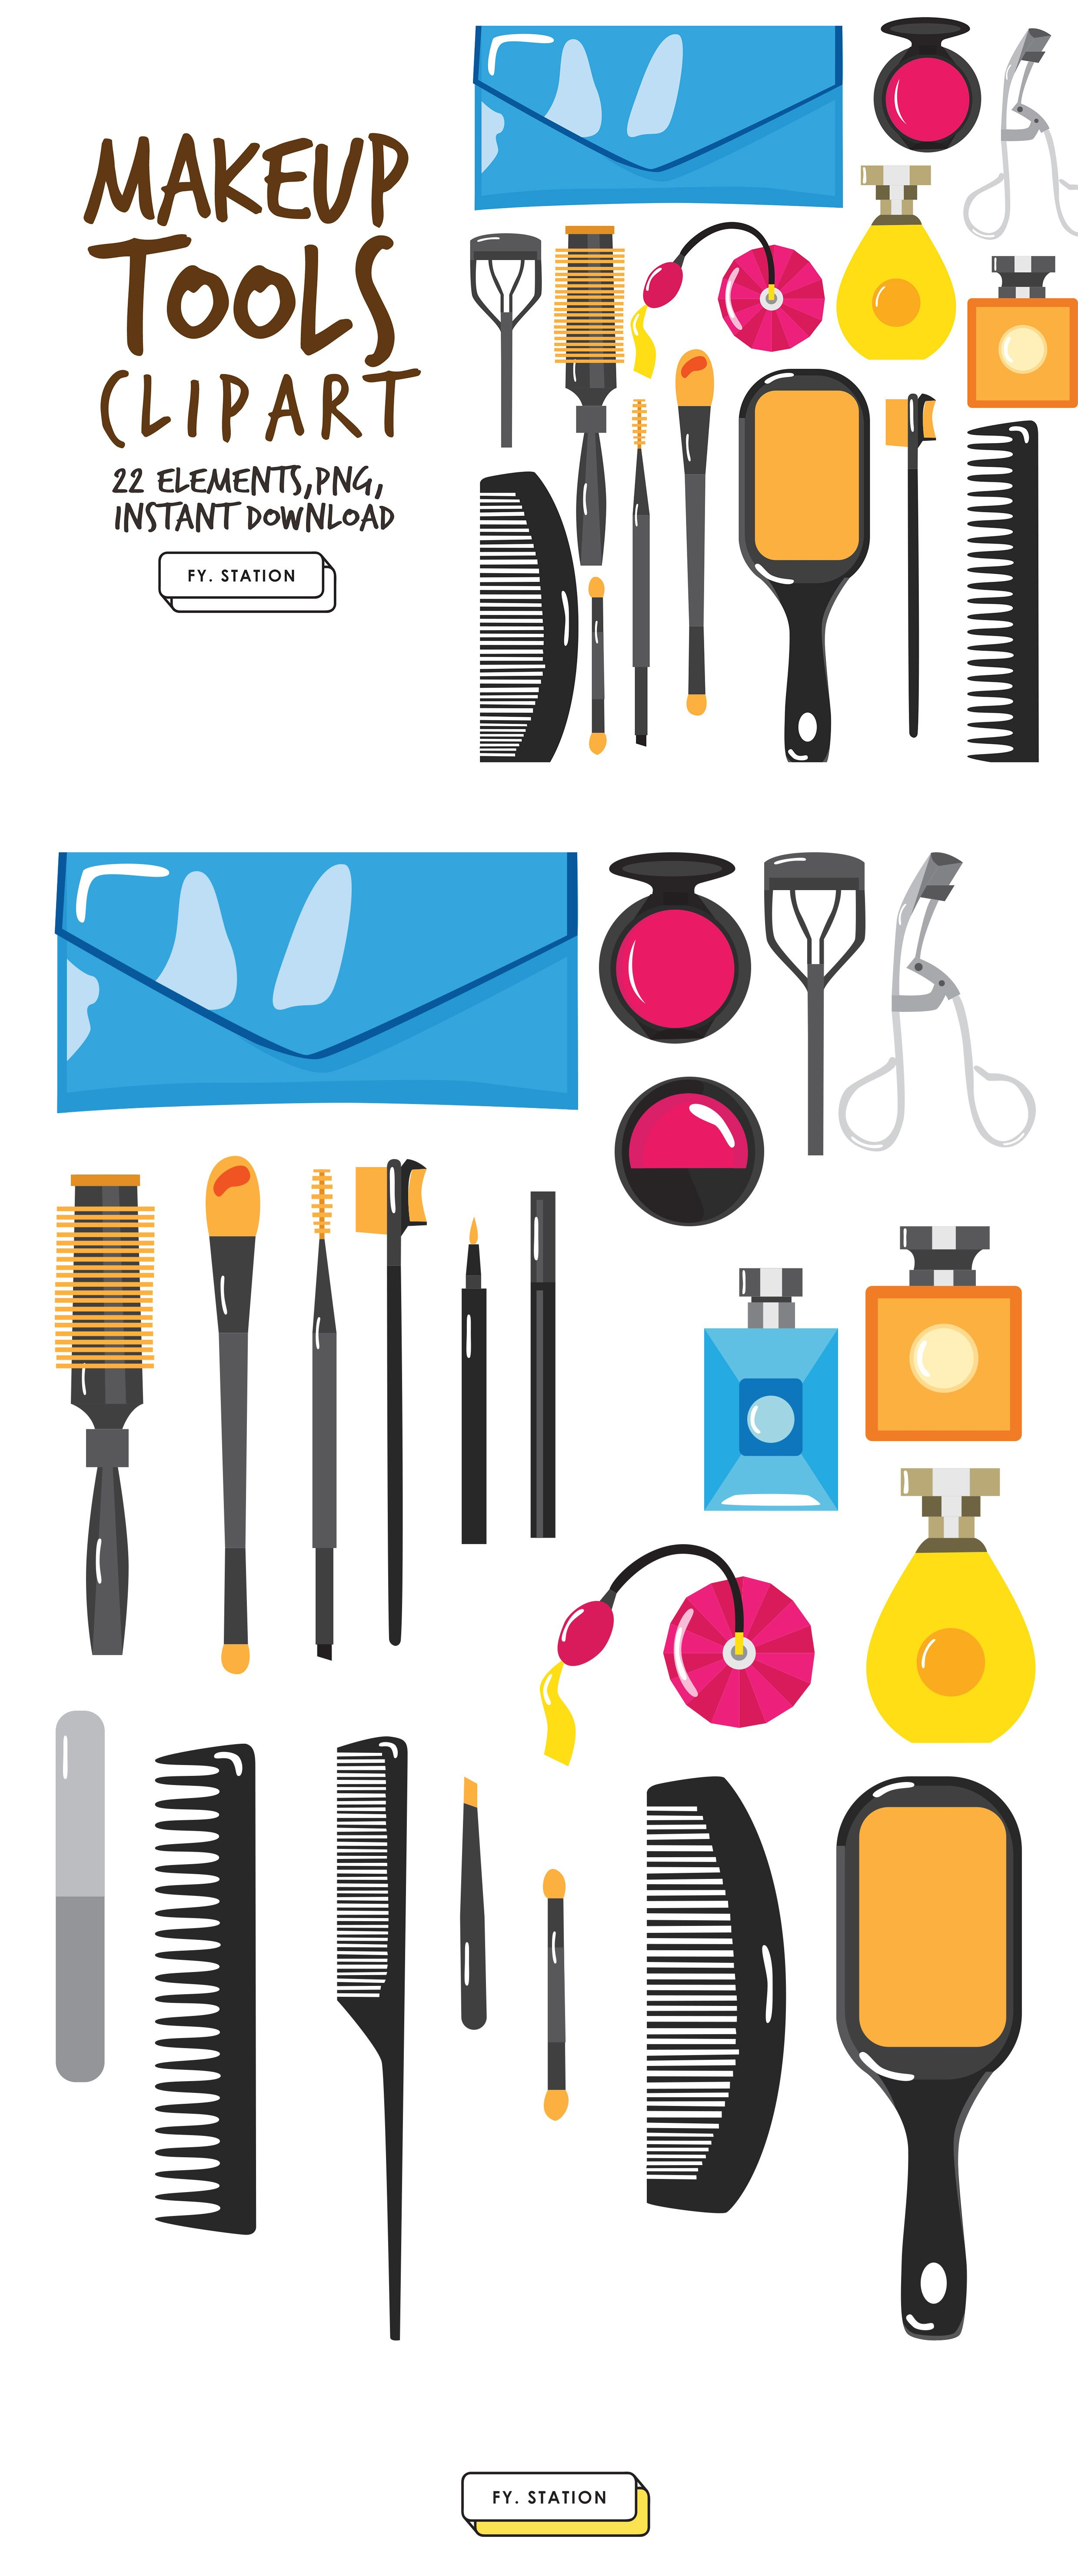 Makeup Tools Clipart Pack 2 Diy Elements Illustration Printable Instant Download Diy Clip Art